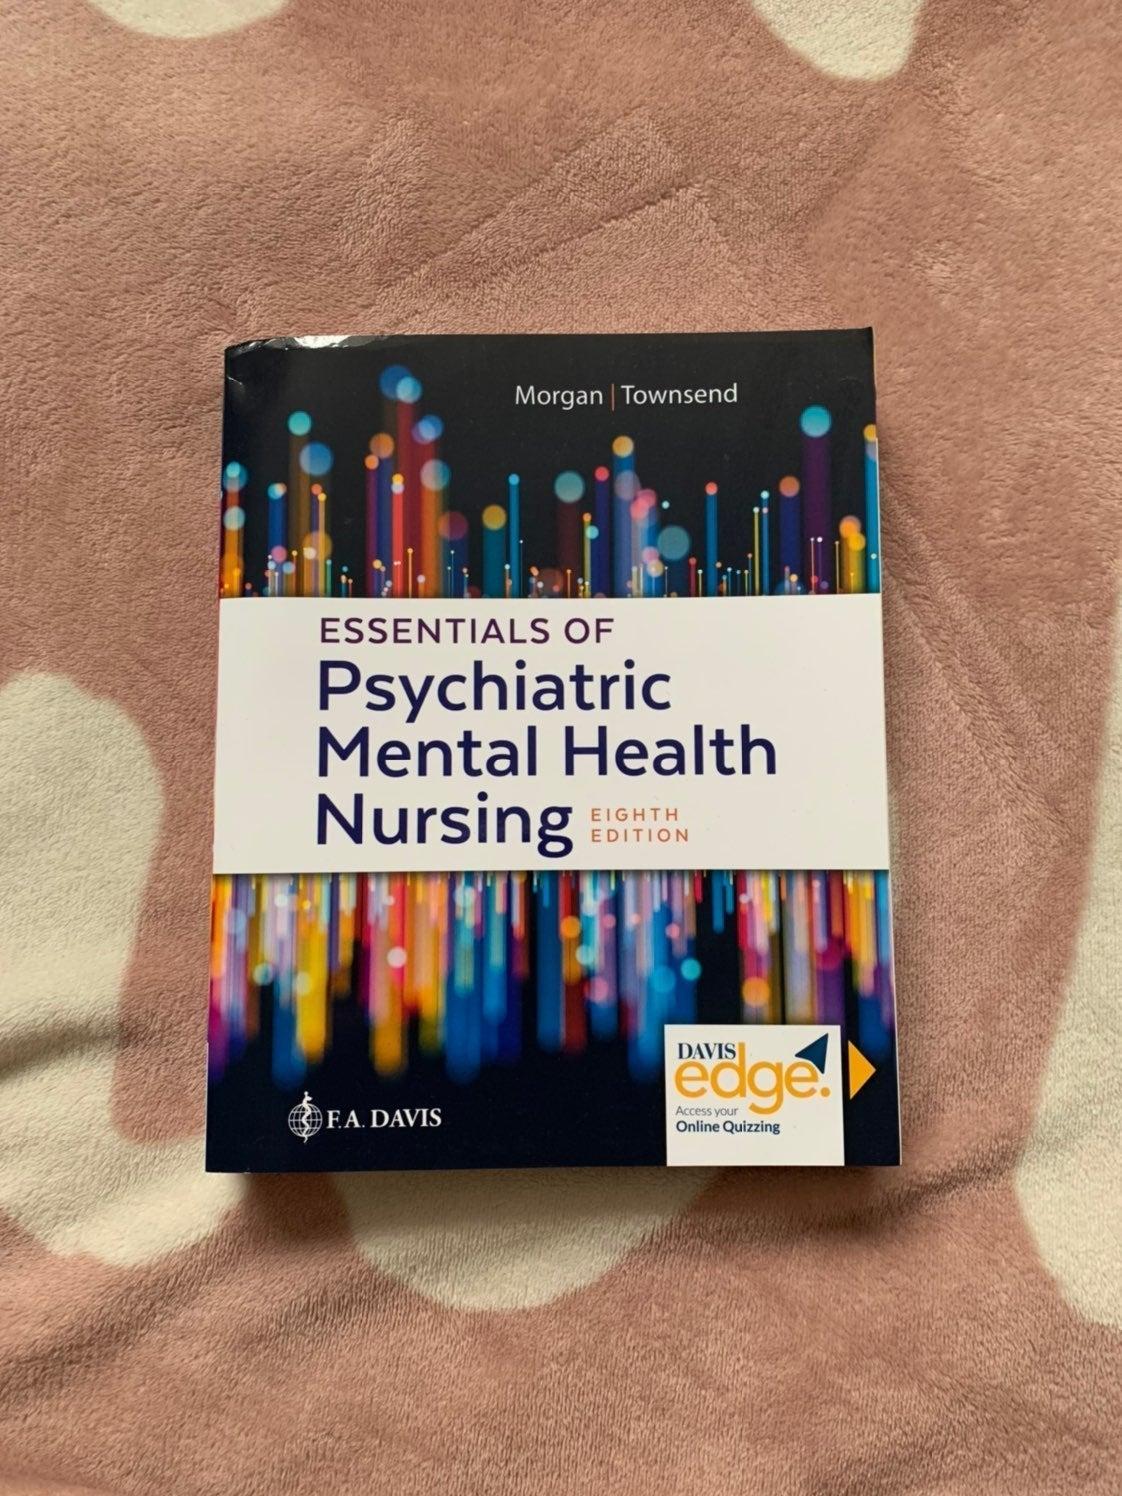 Essentials of Psychiatric Mental Health